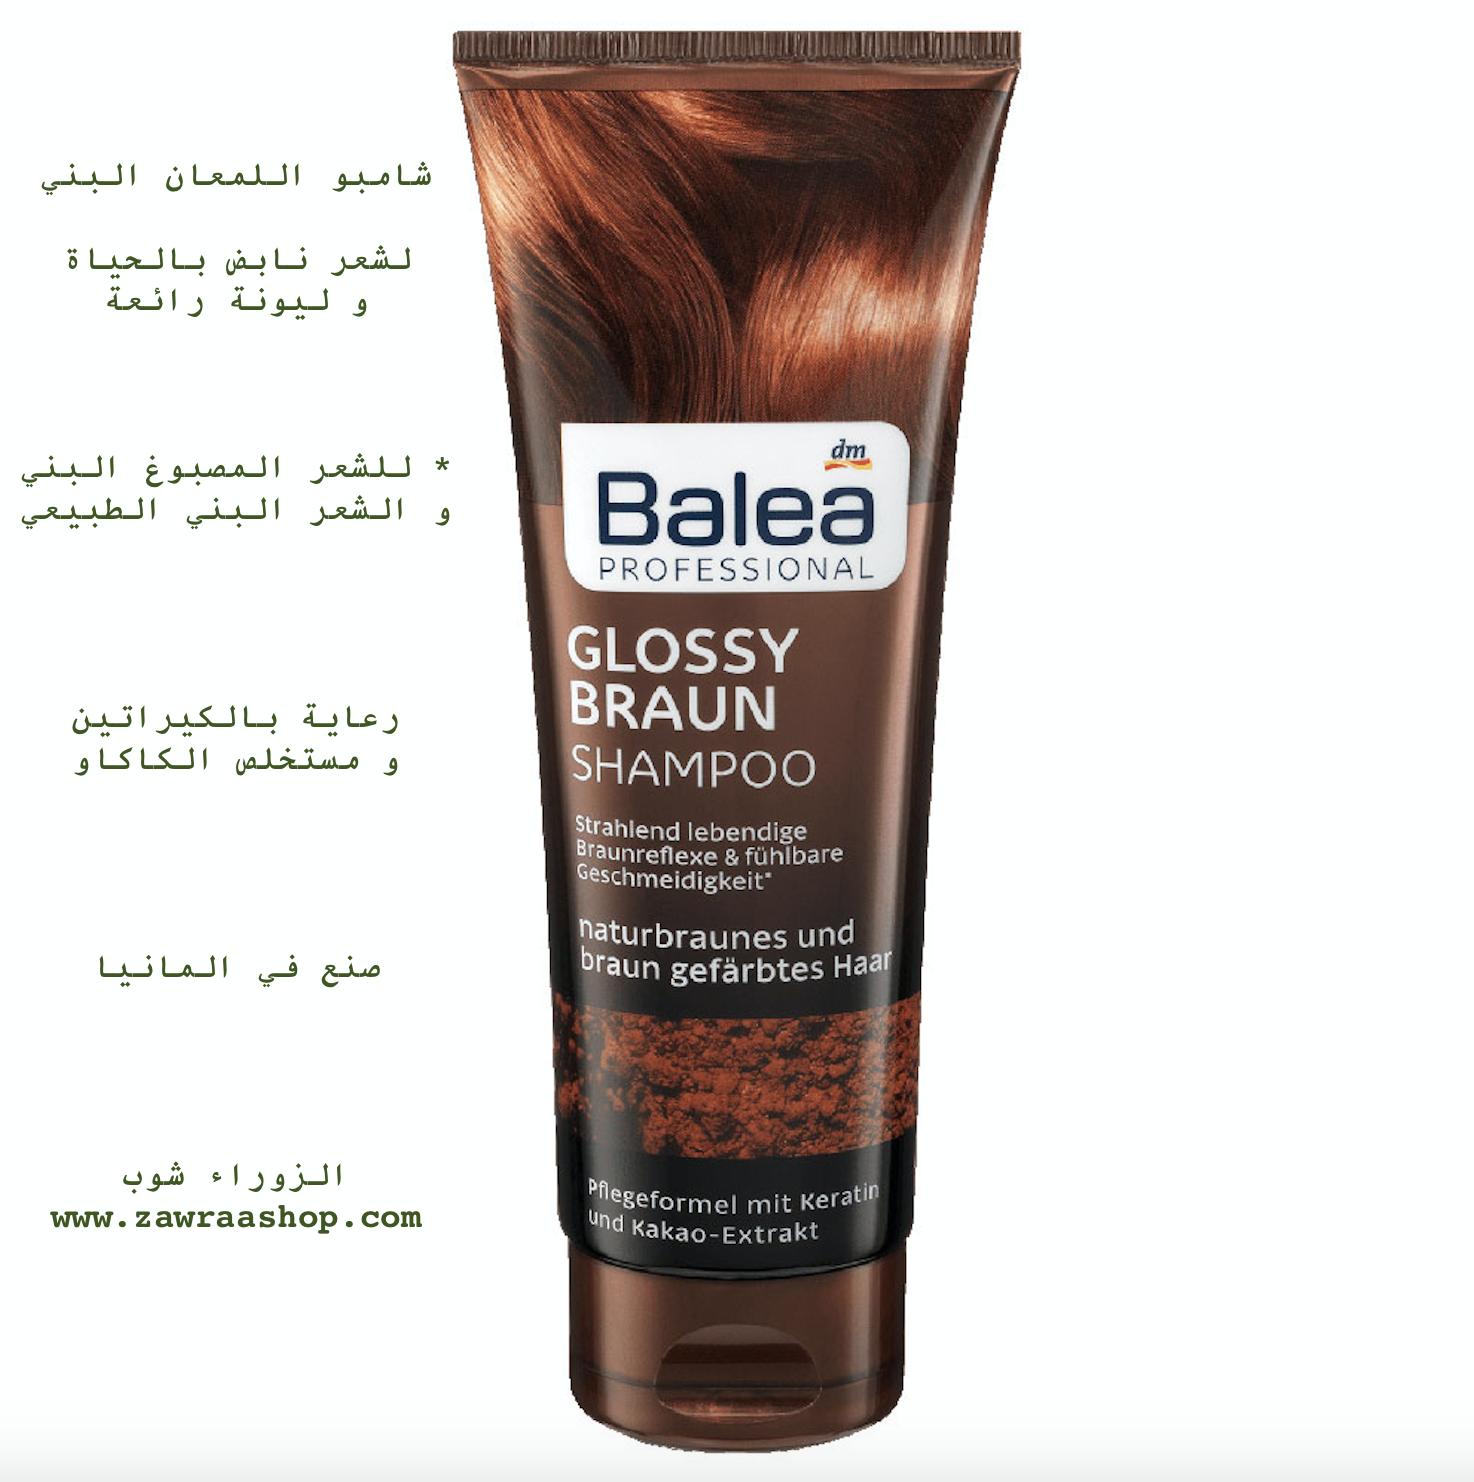 B408 glossy braun shampoo شامبو عصارة ٢٥٠ نل للشعر البني الحريري